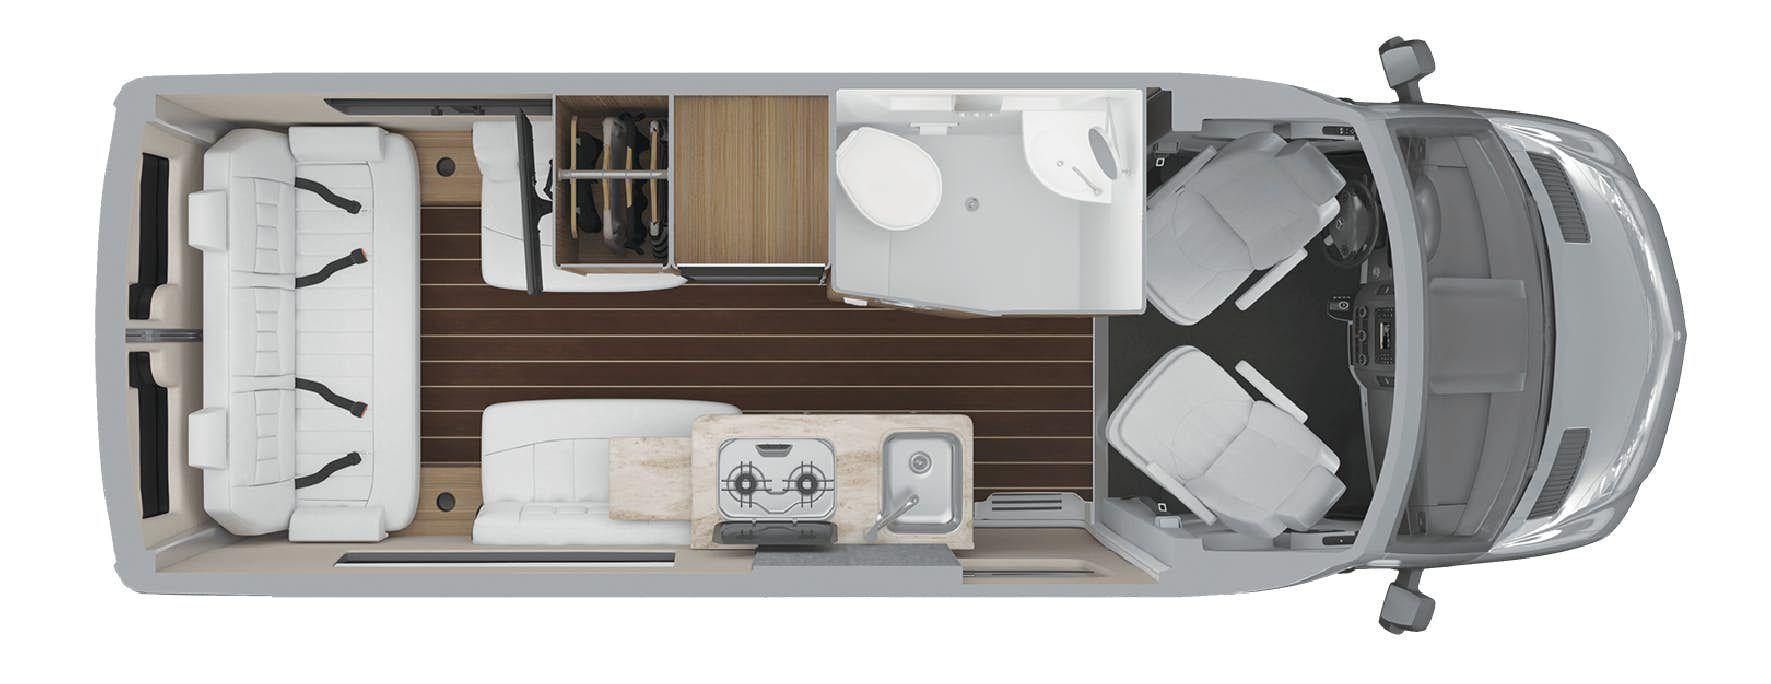 Airstream plan